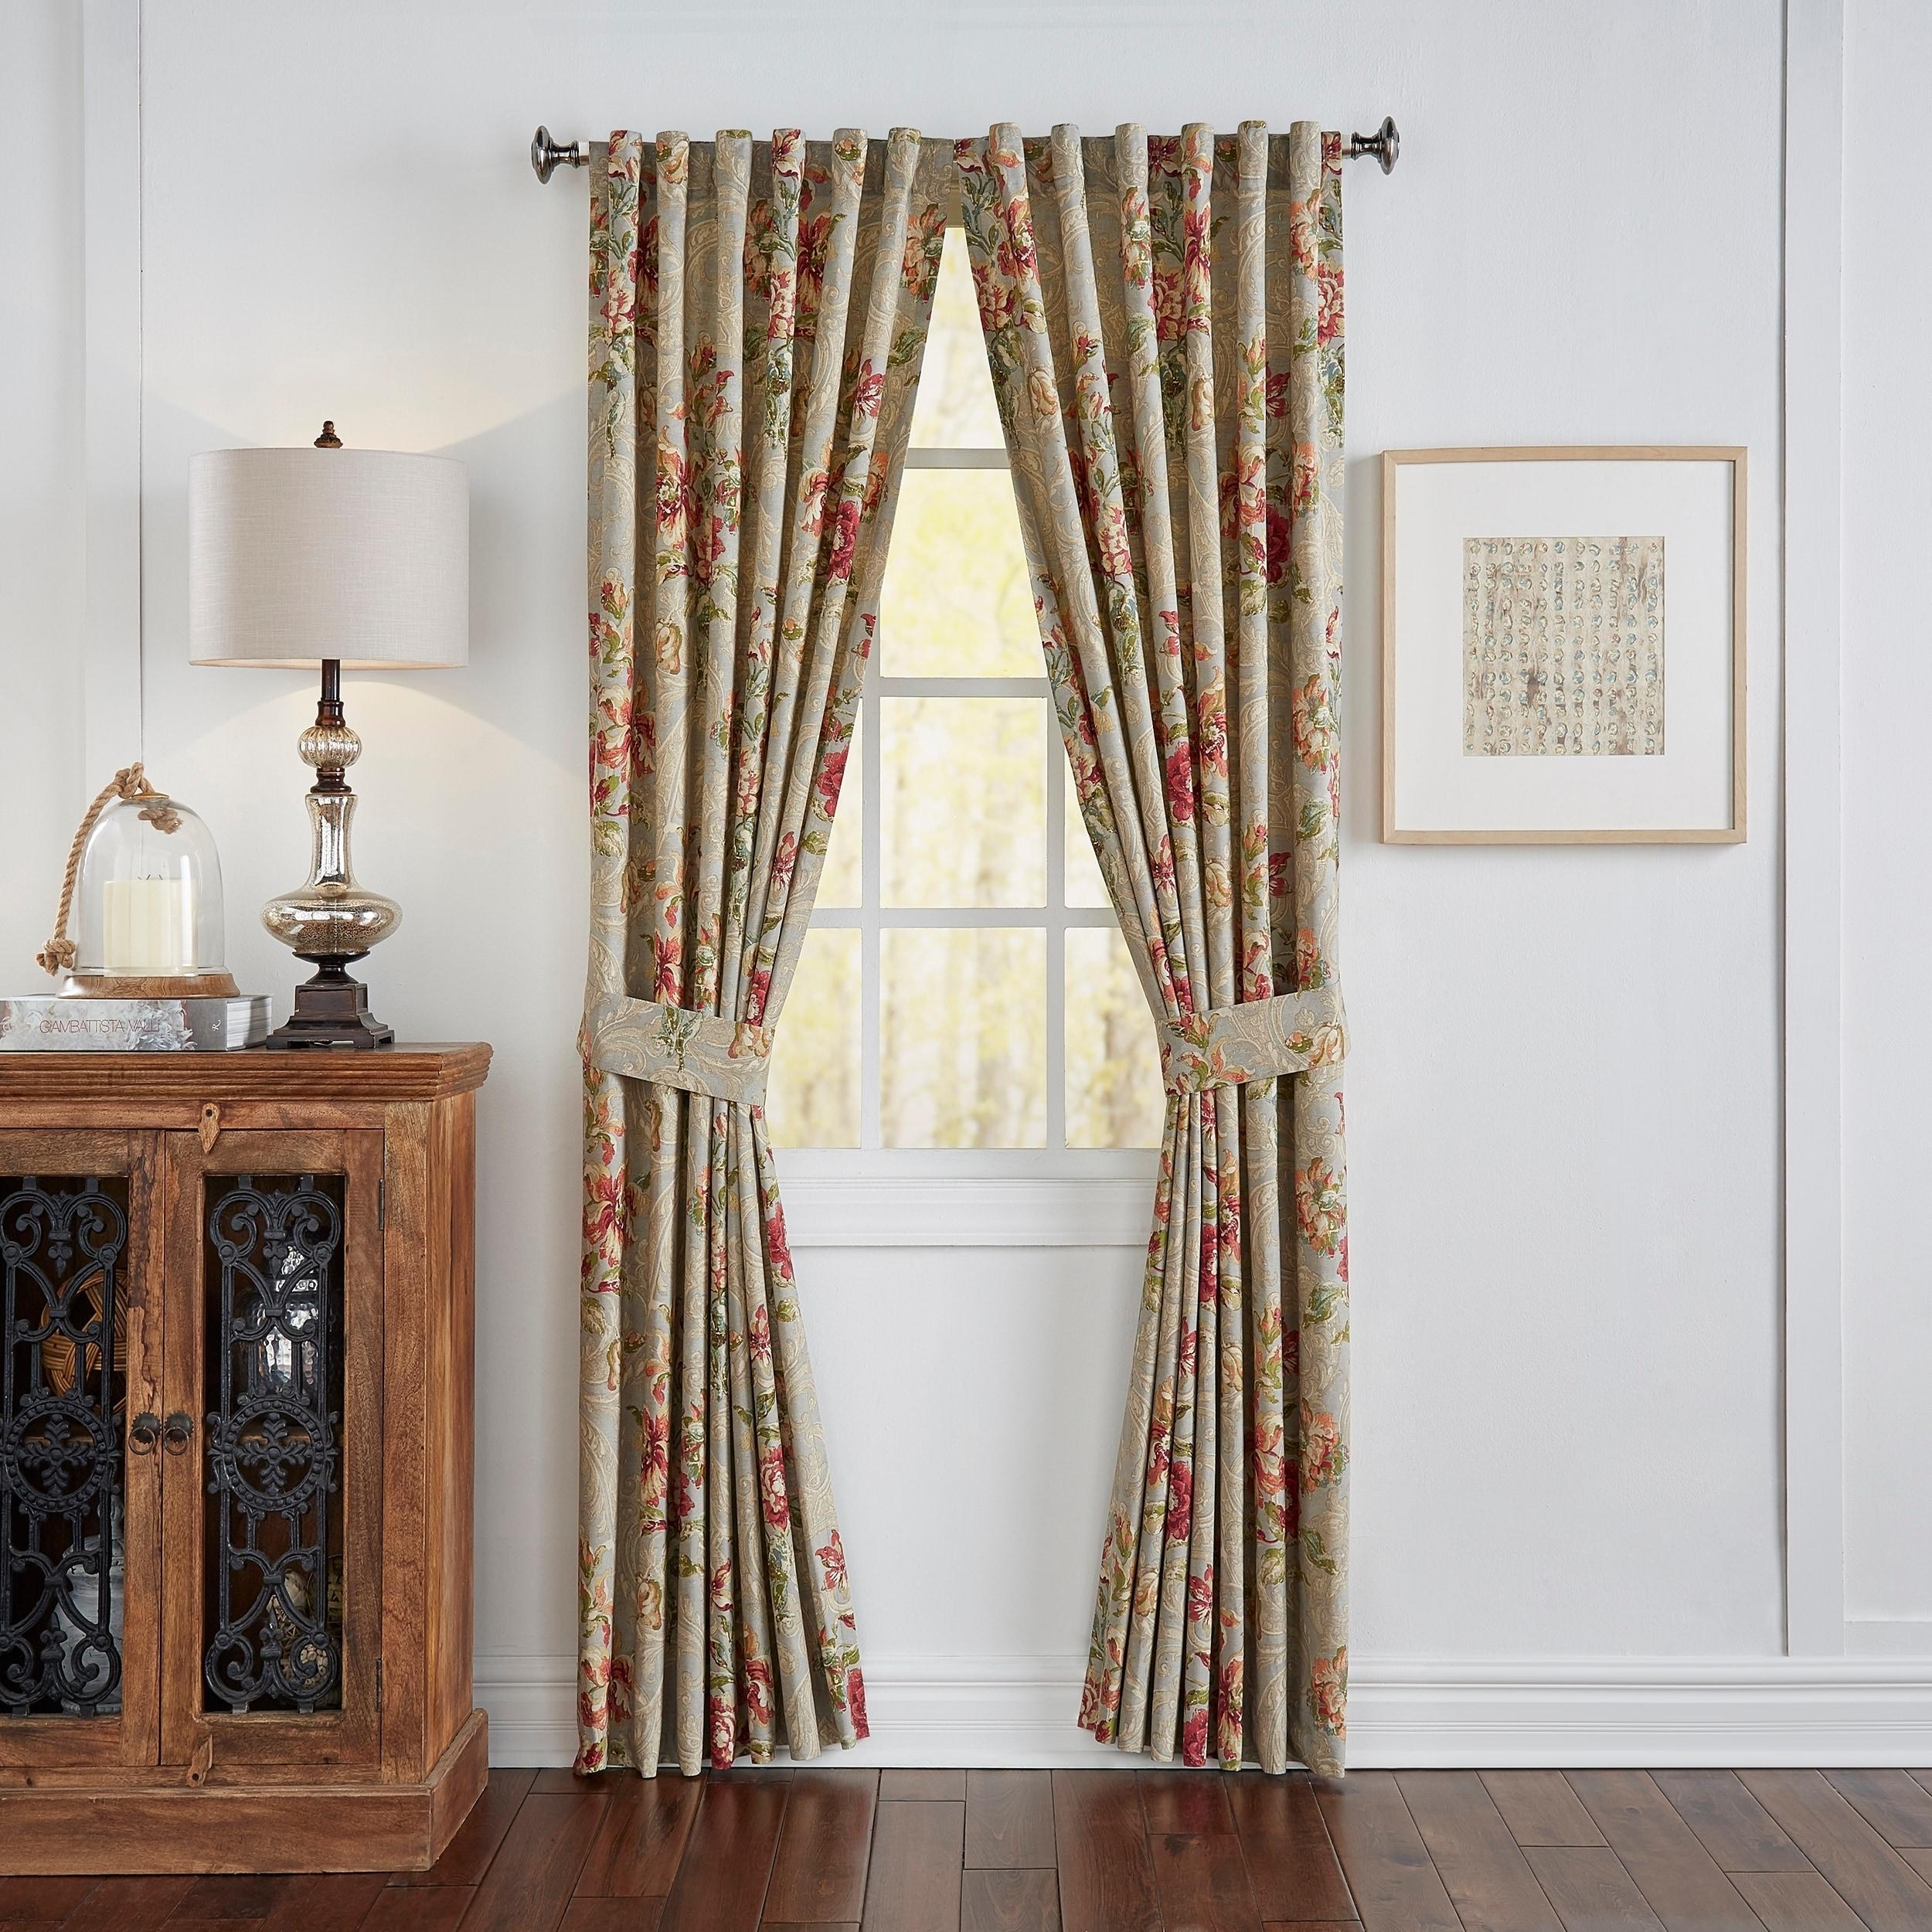 Waverly Fresco Flourish Window Drapery Pair, Size 84 (Cot...